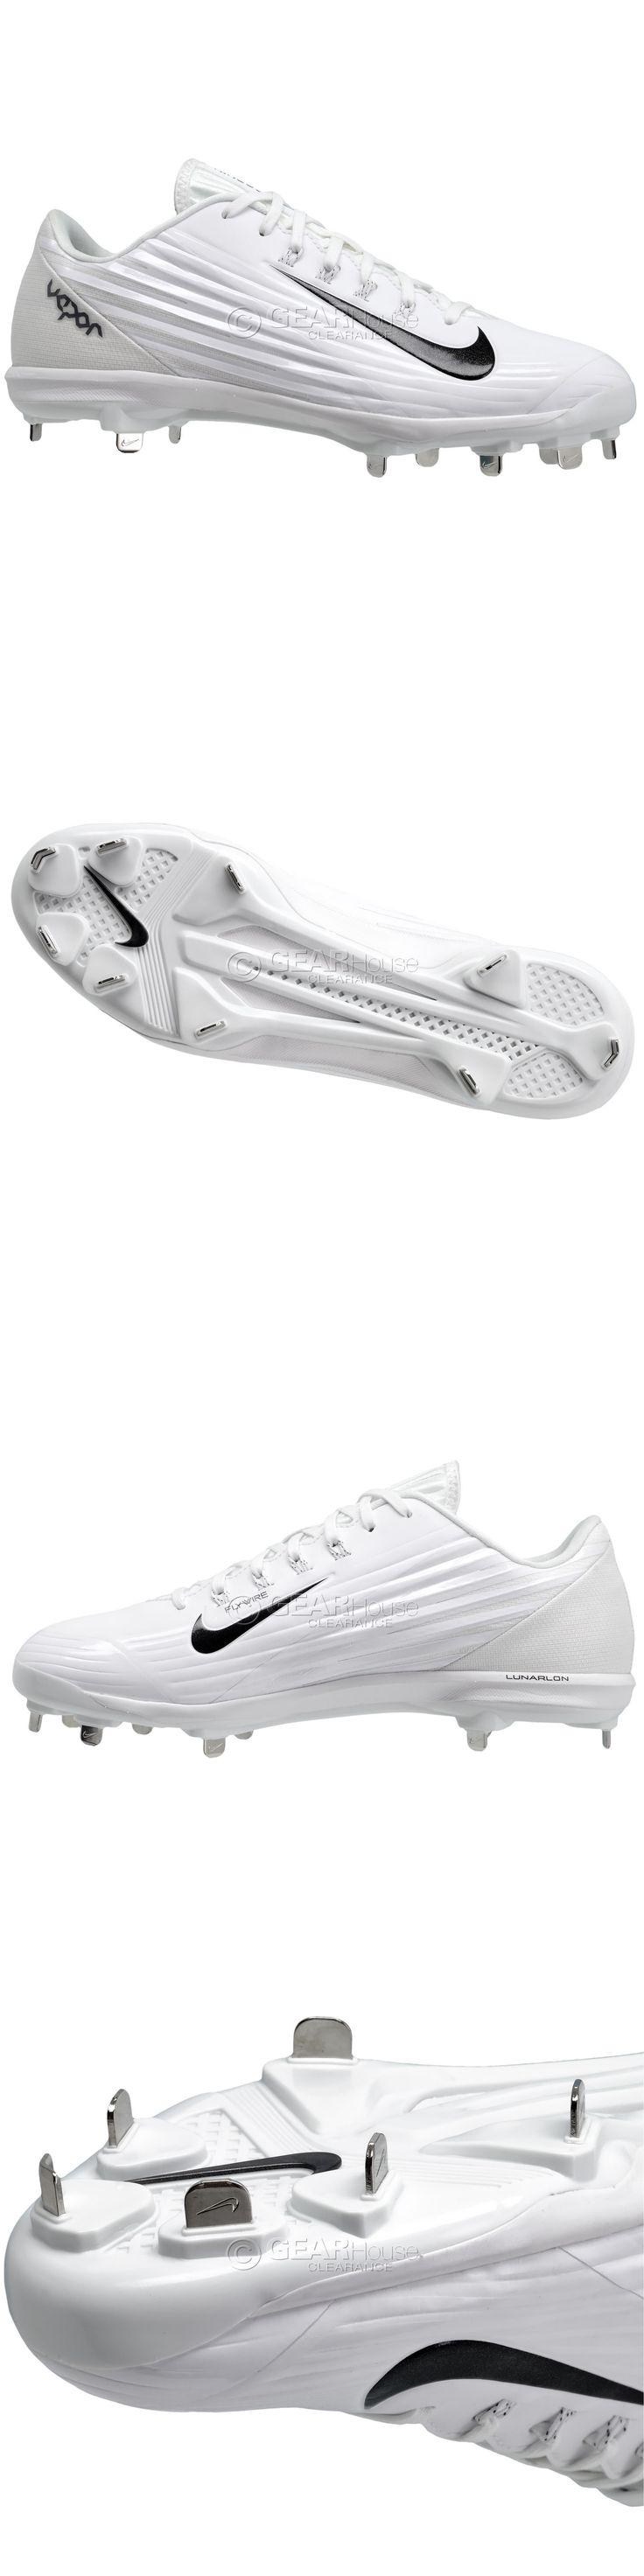 Mens 159059: New Nike Lunar Vapor Pro Low Metal Mens Baseball Cleats :  White -